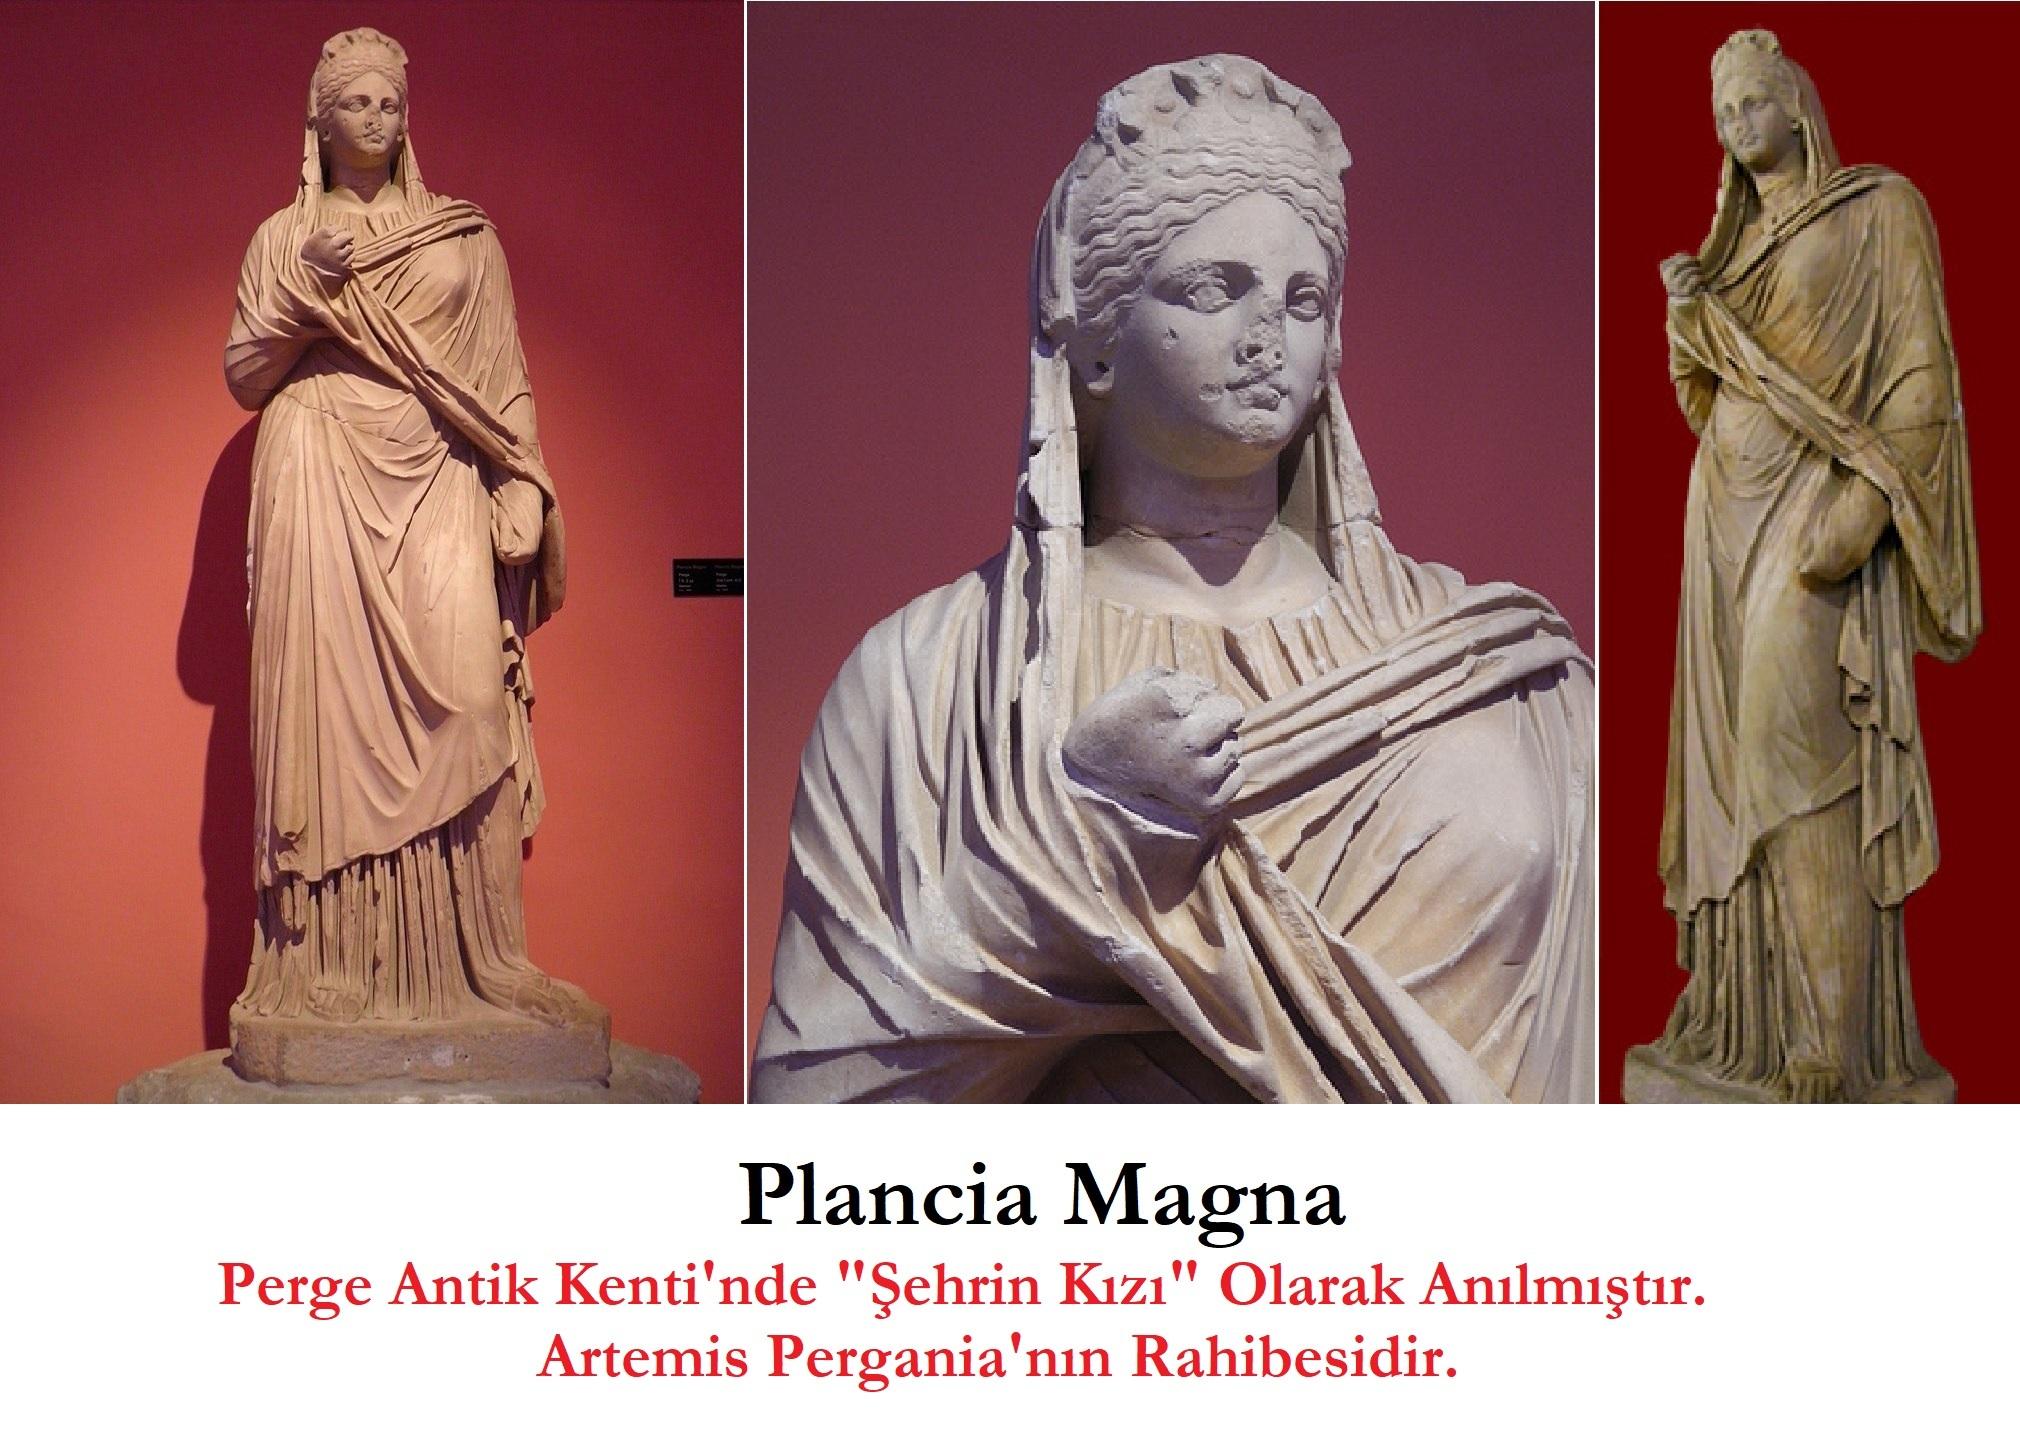 Plancia Magna – Perge'nin Kurucu Kadını